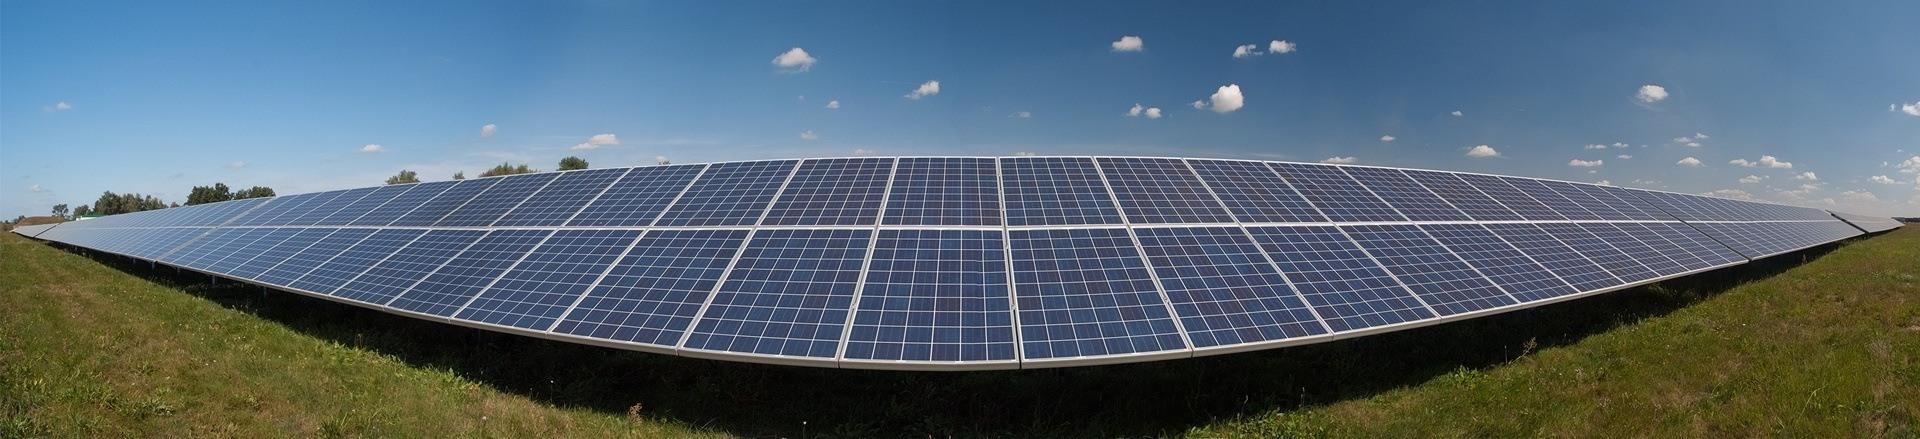 DiSUN Deutsche Solarsevice GmbH